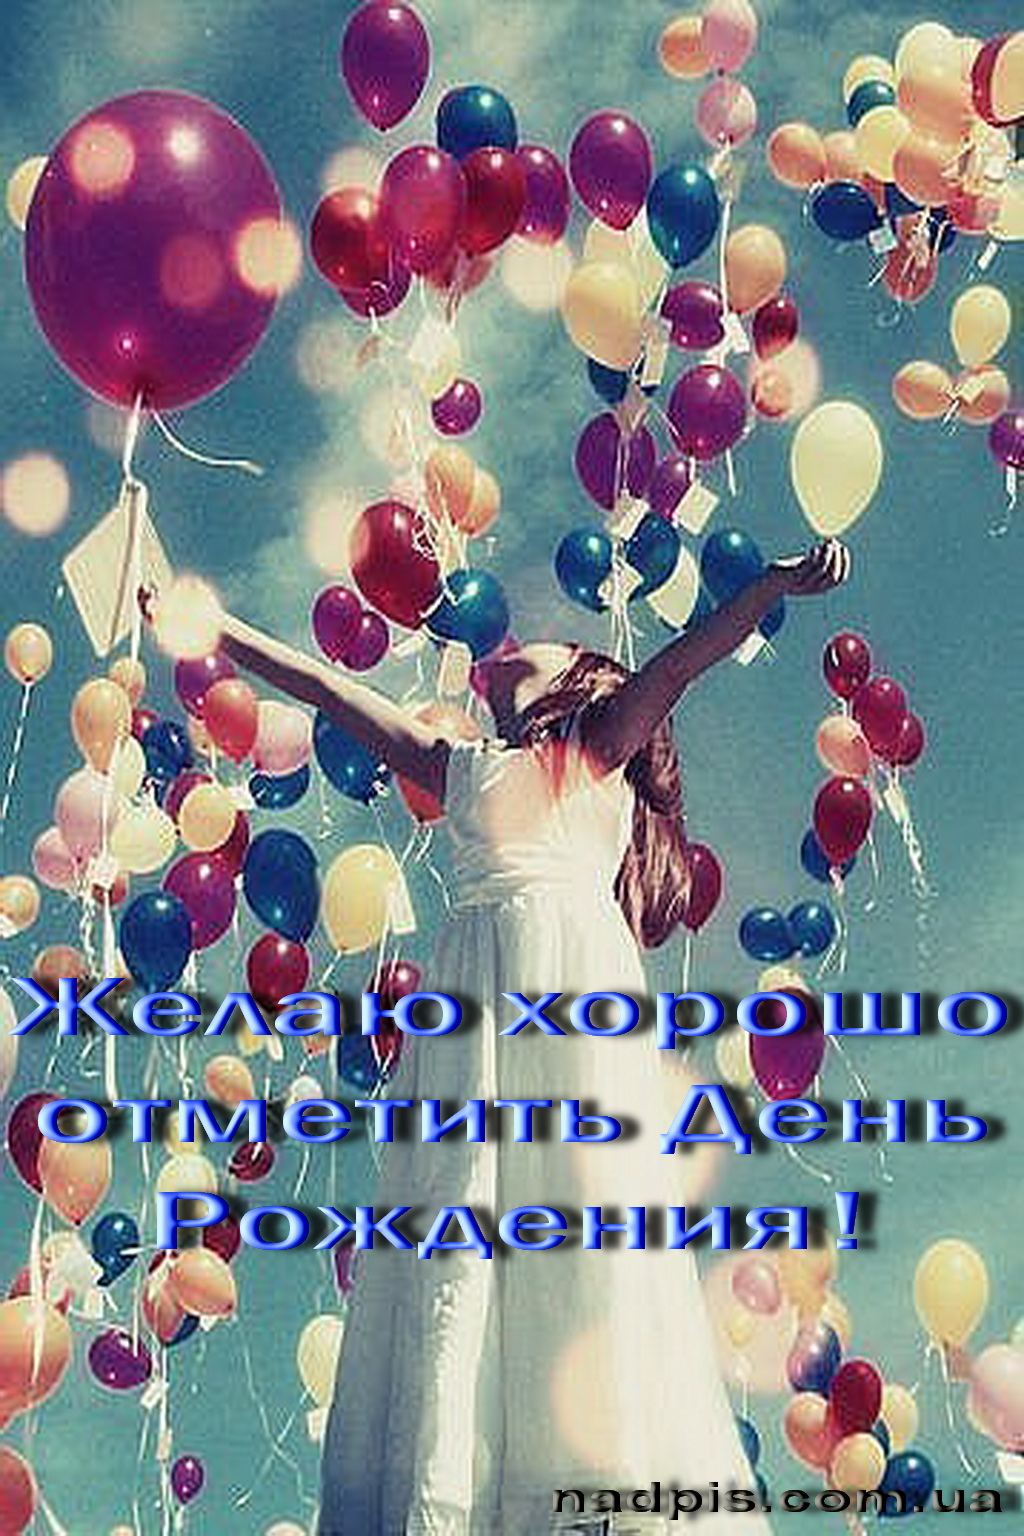 Желаю хорошо отметить | Картинки с ...: nadpis.com.ua/zhelayu-xorosho-otmetit